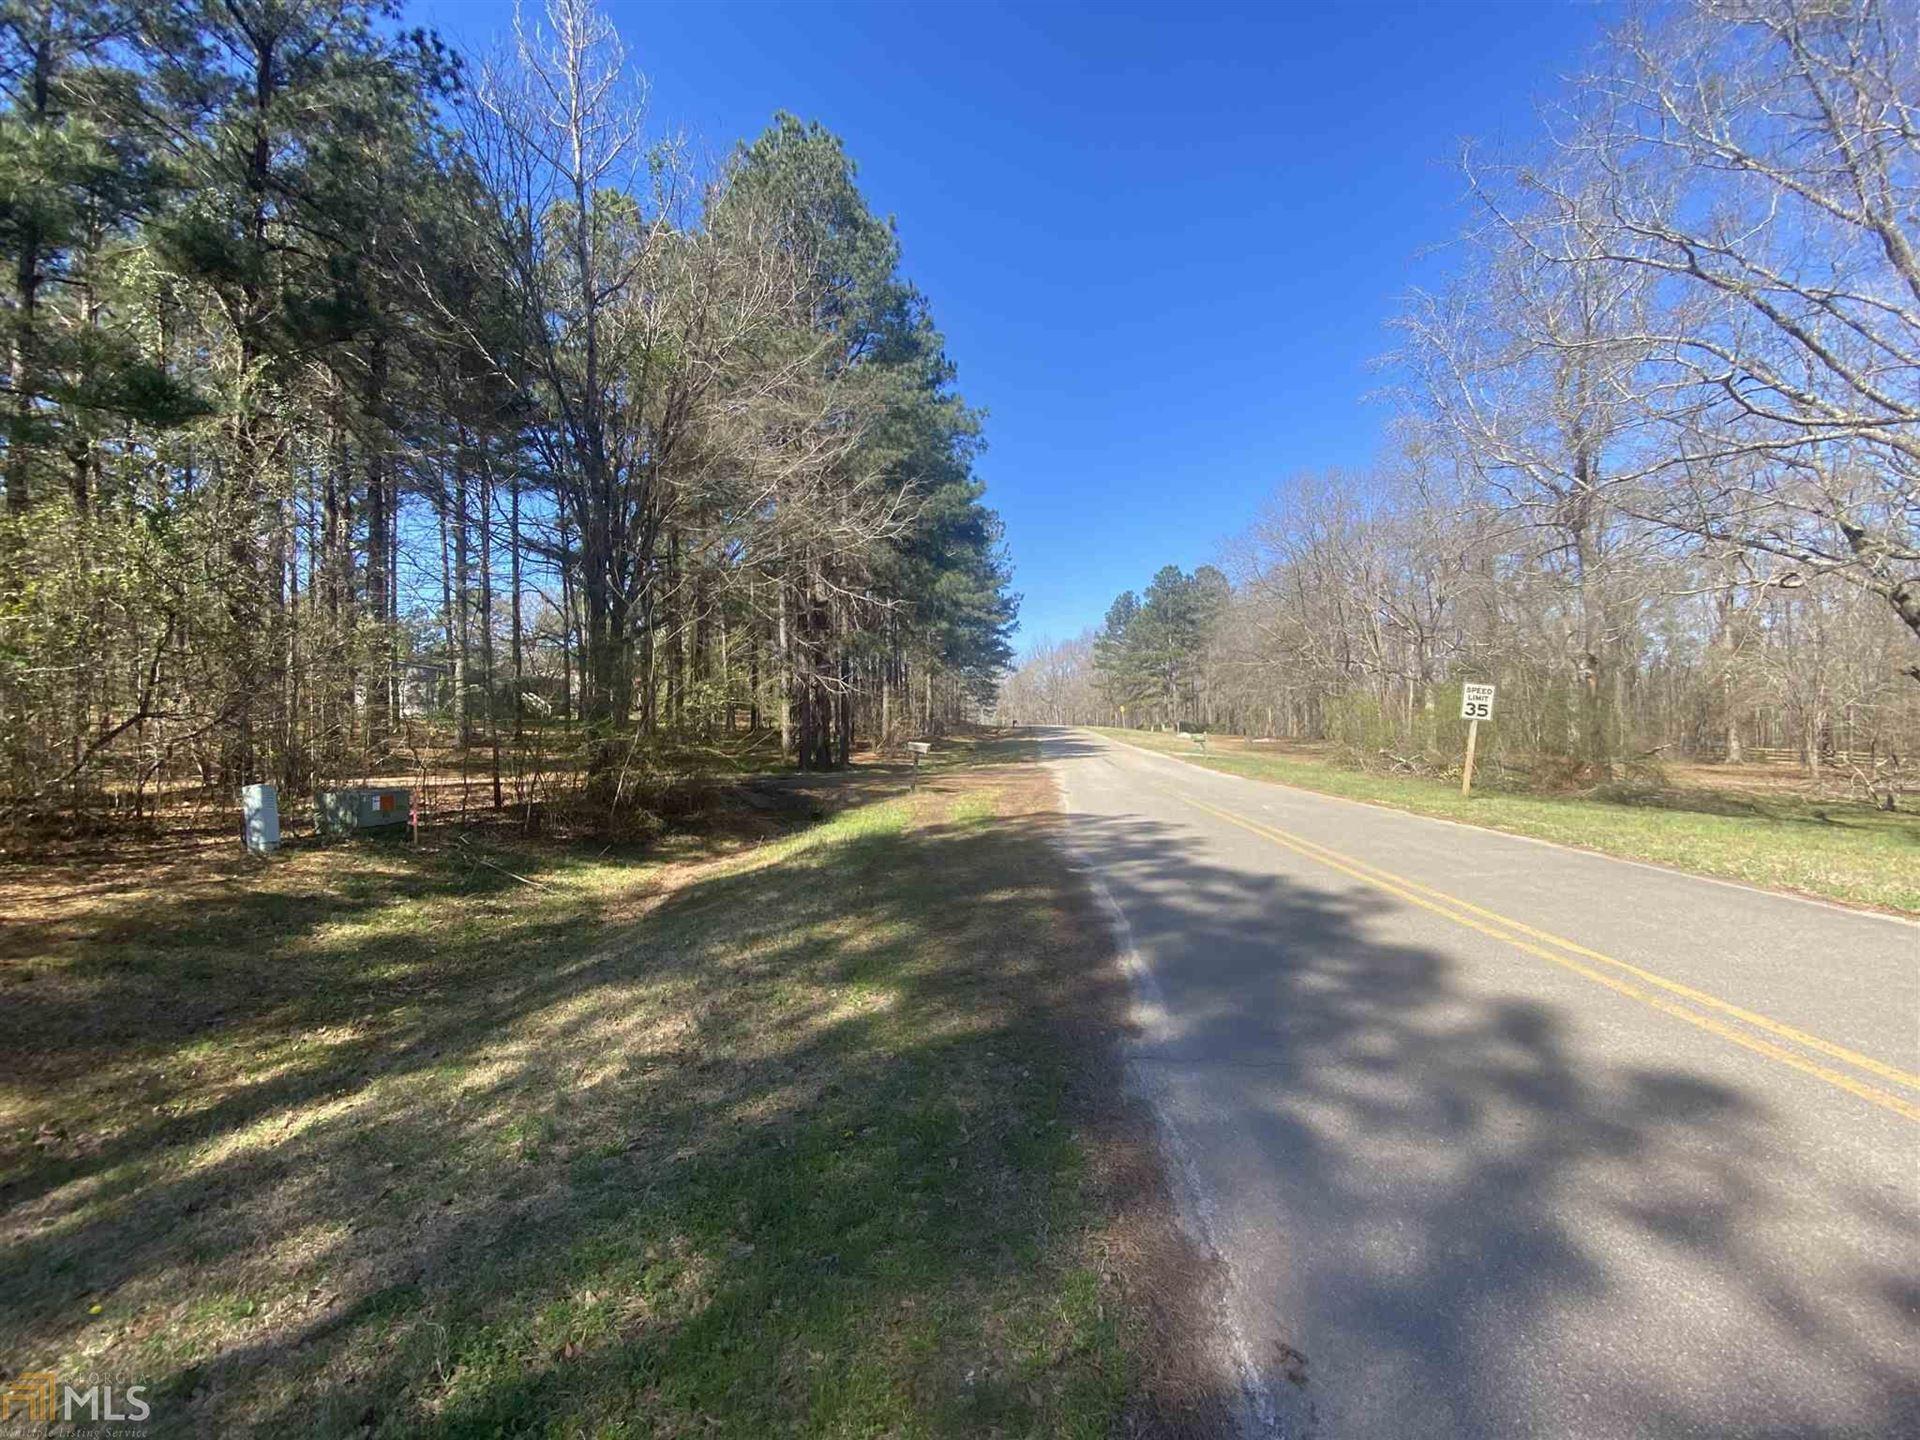 Photo of 0 Transylvania Dr, Sandersville, GA 31082 (MLS # 8937466)